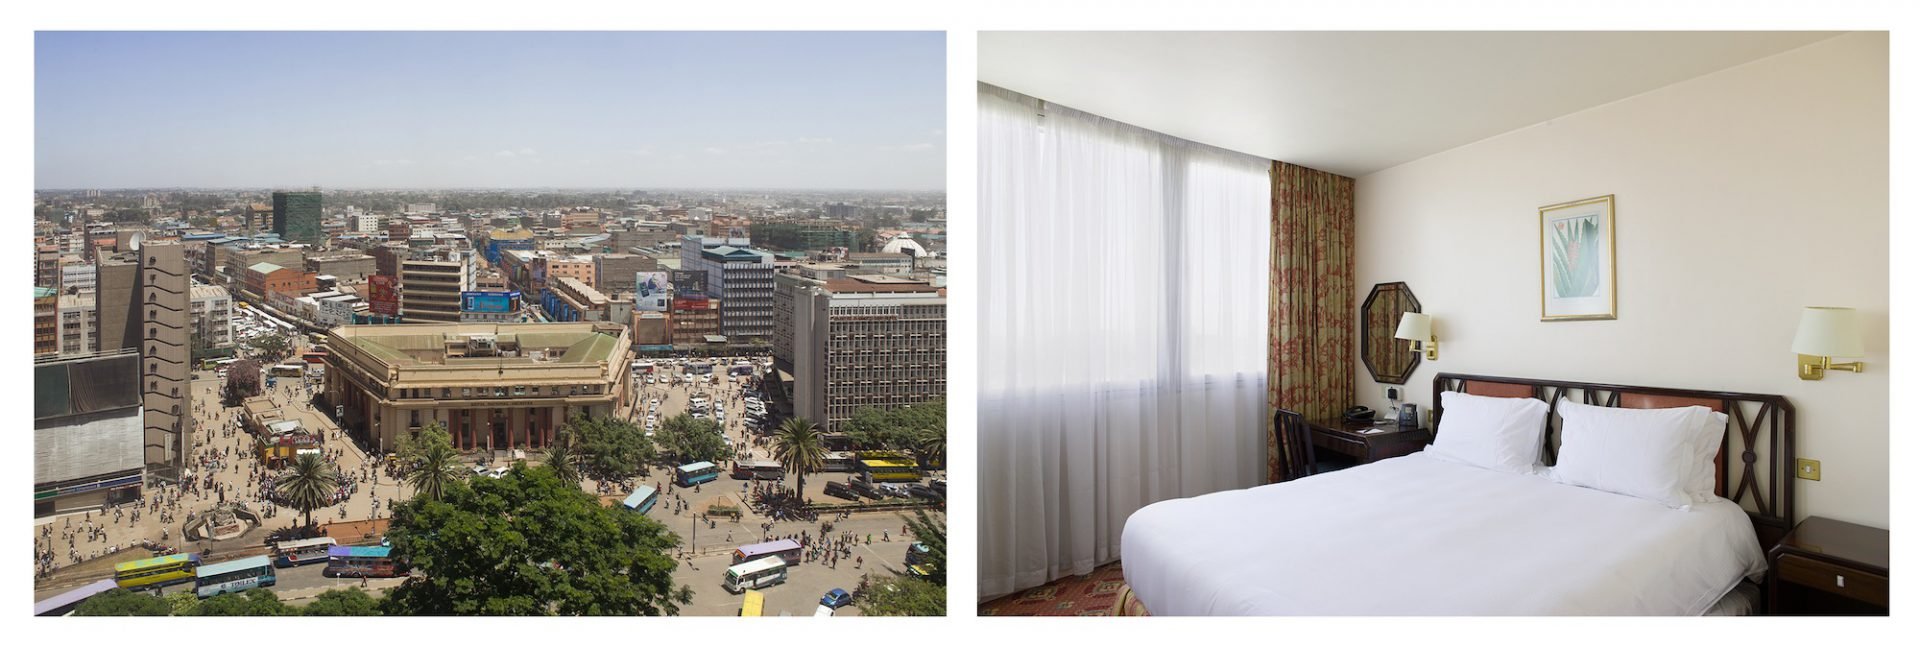 Seite 68–69.  04.02.2016, Nairobi, Room 1314